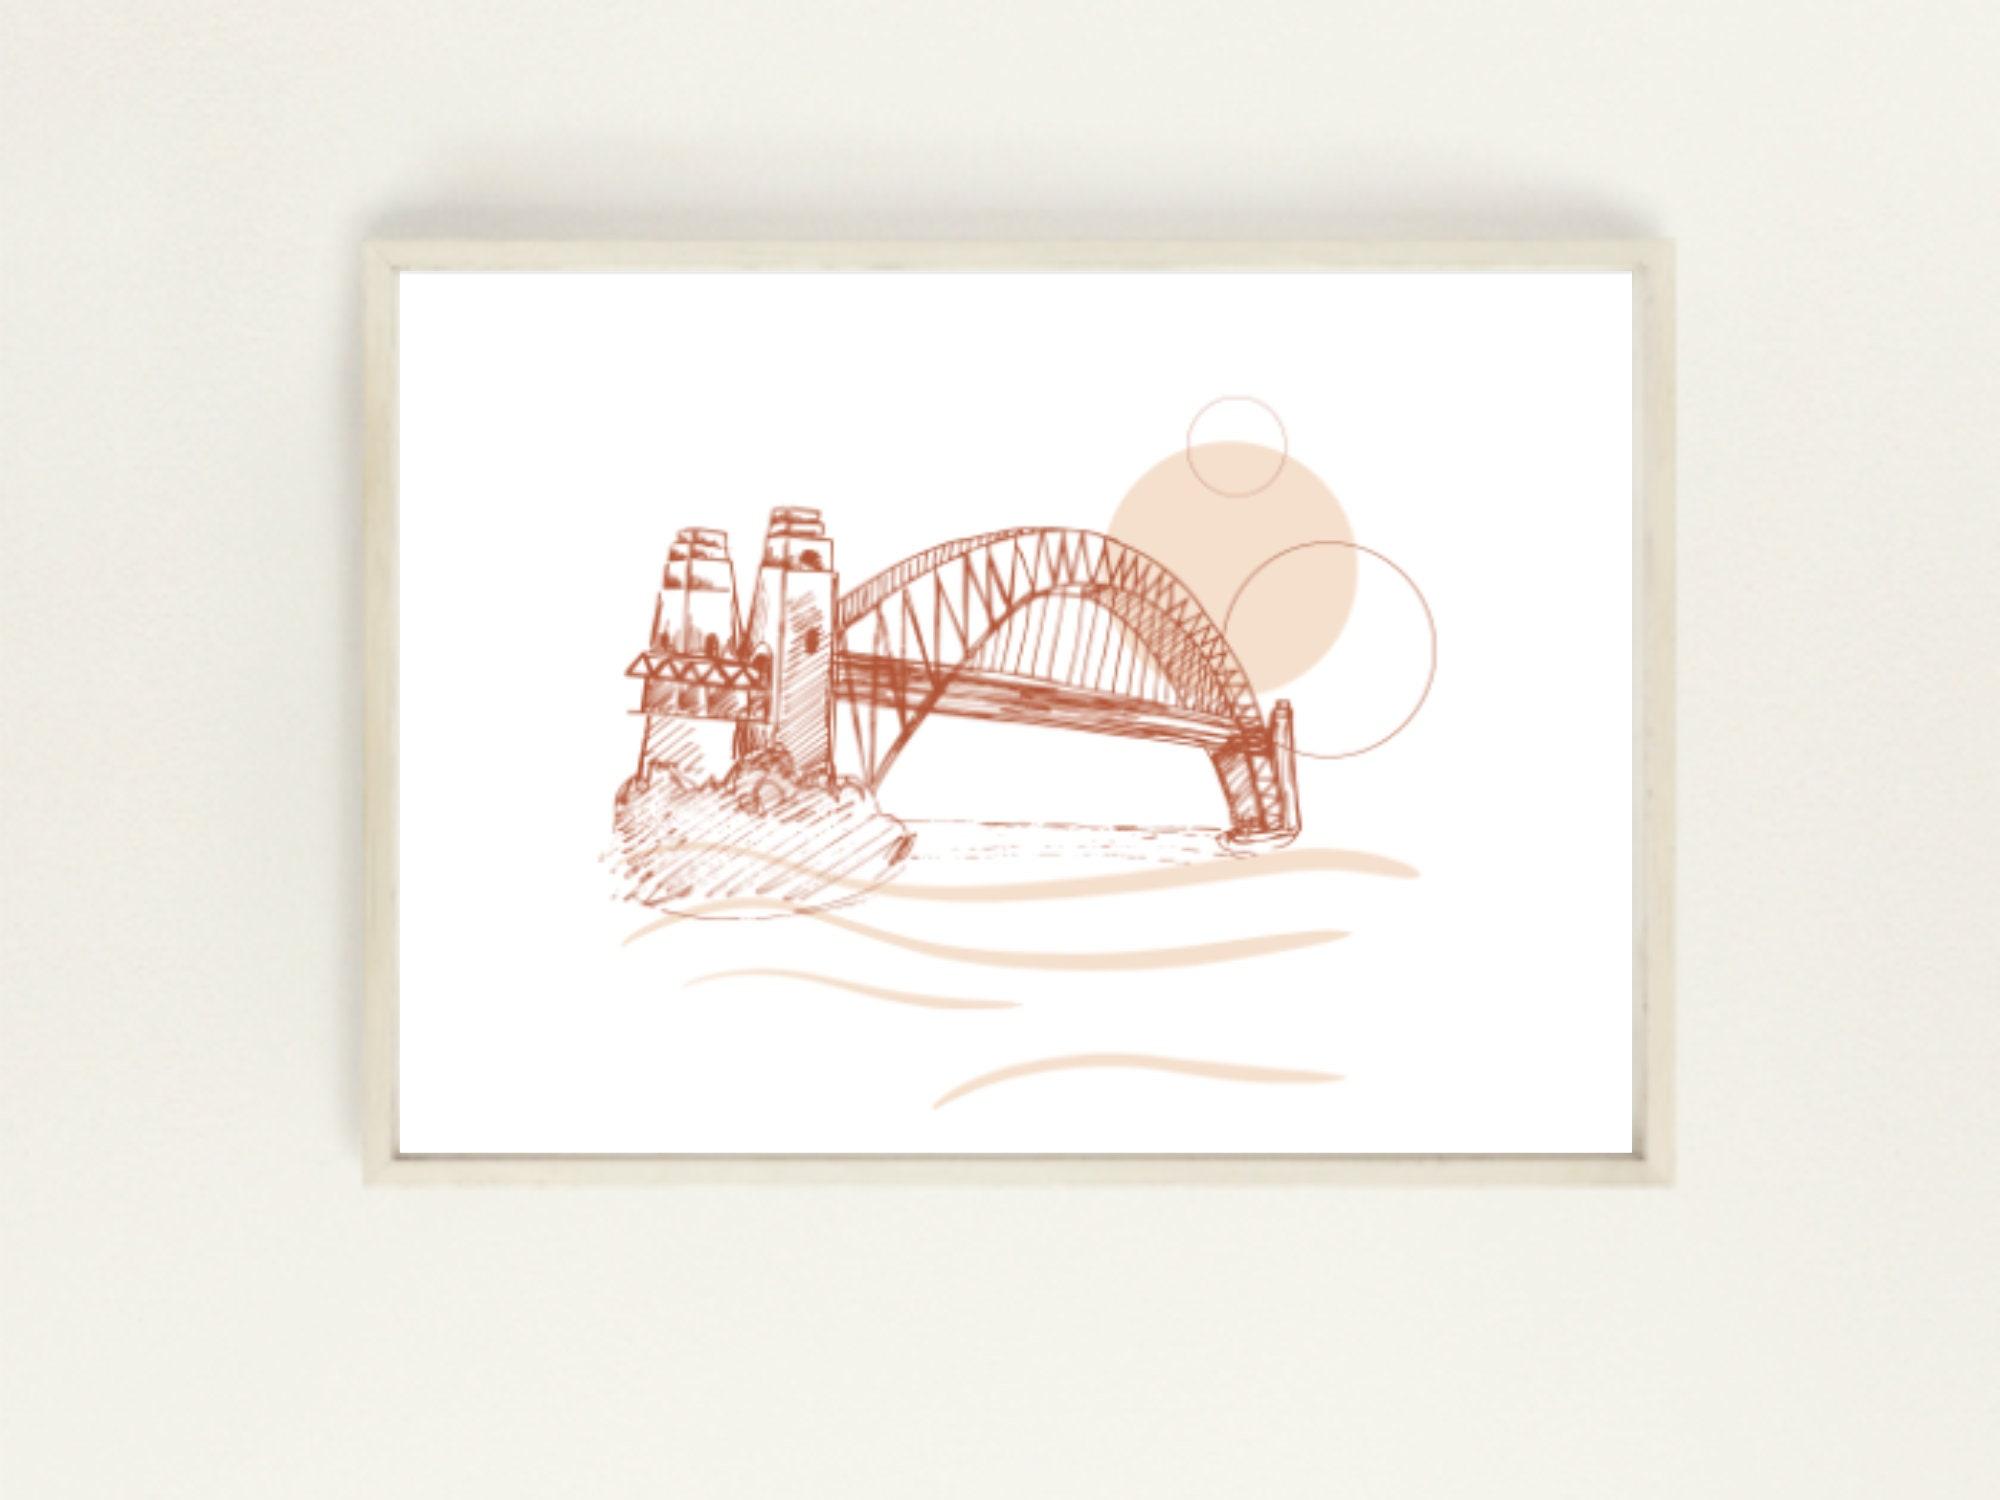 Australia Print Wall Art Sydney Print At Home GPO Digital Download File